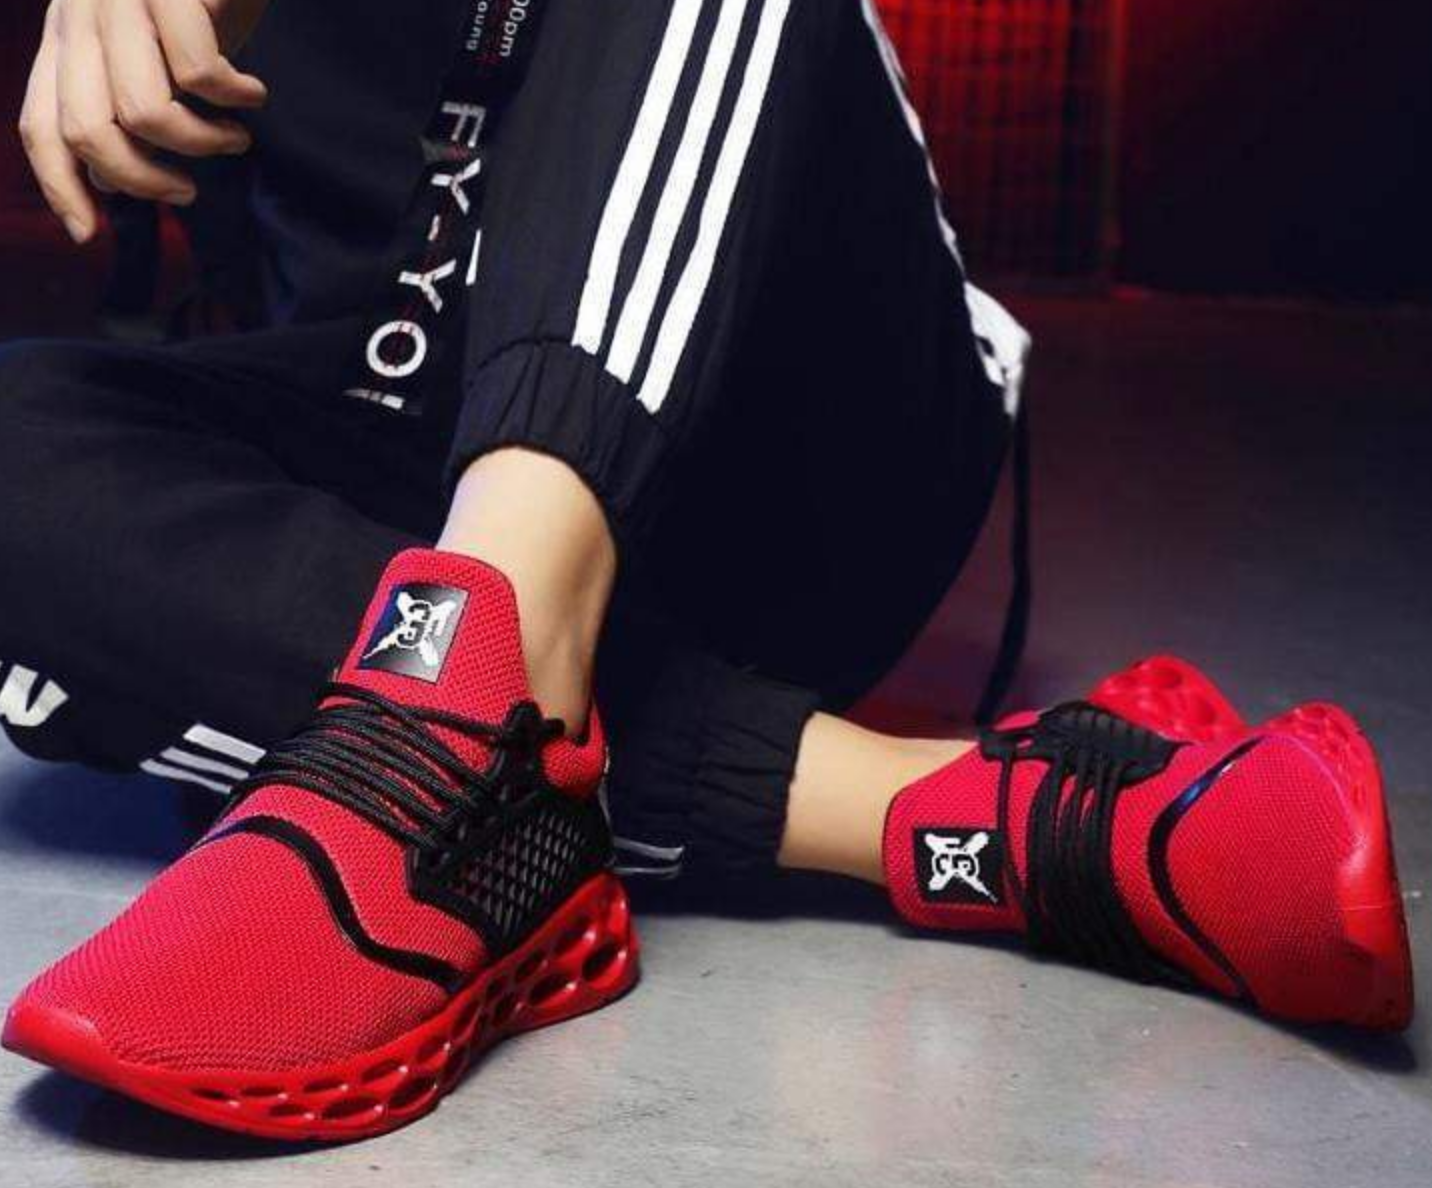 Fashion Meets Fitness   ROVUX Footwear